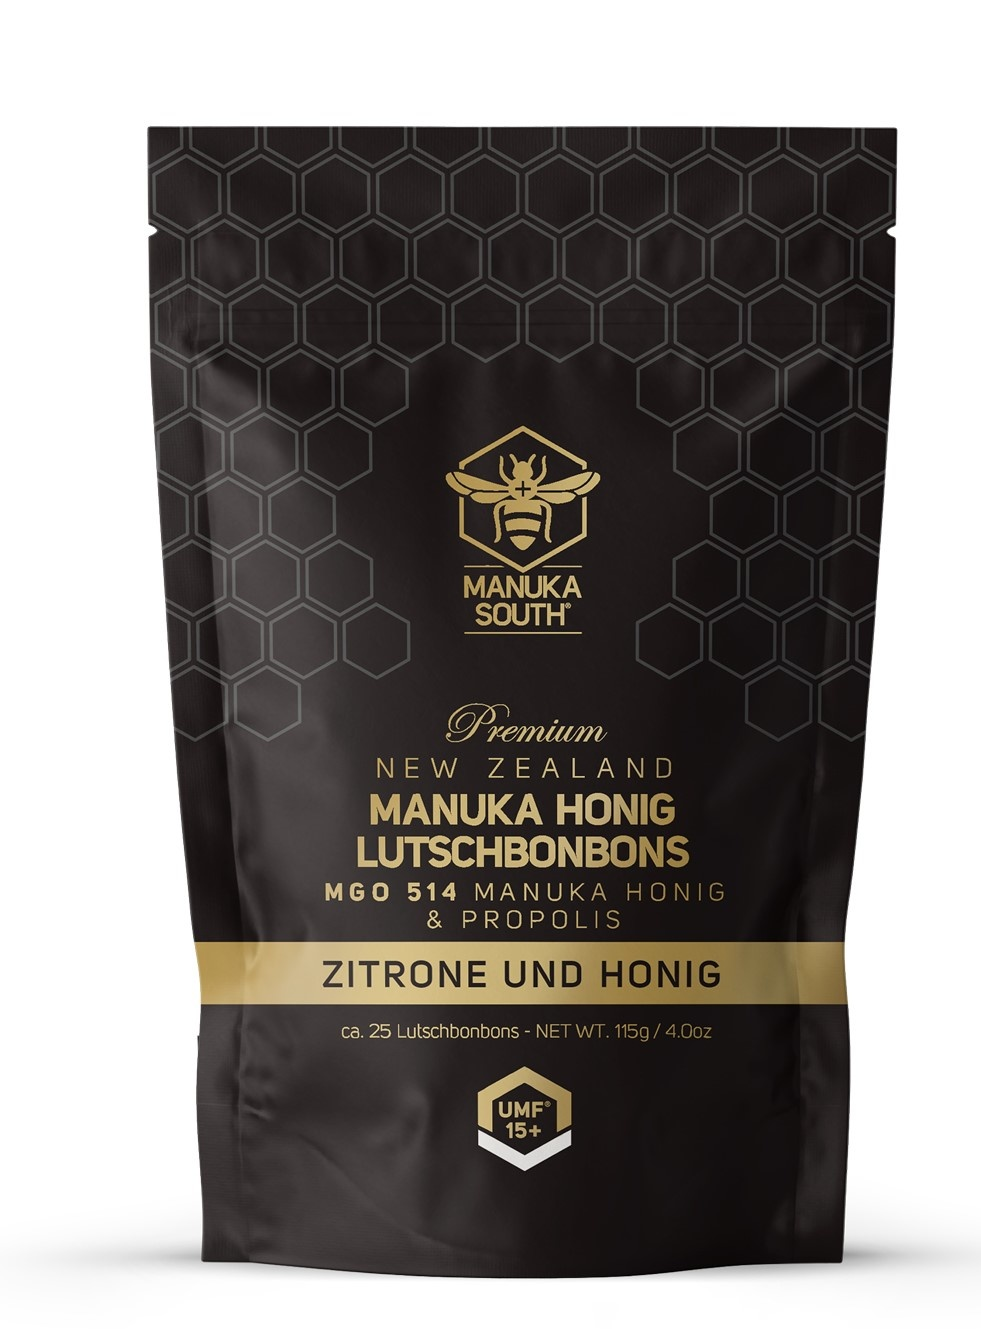 Manuka South ® Manuka Bonbons MGO 514 / UMF 15+ Lemon Honey